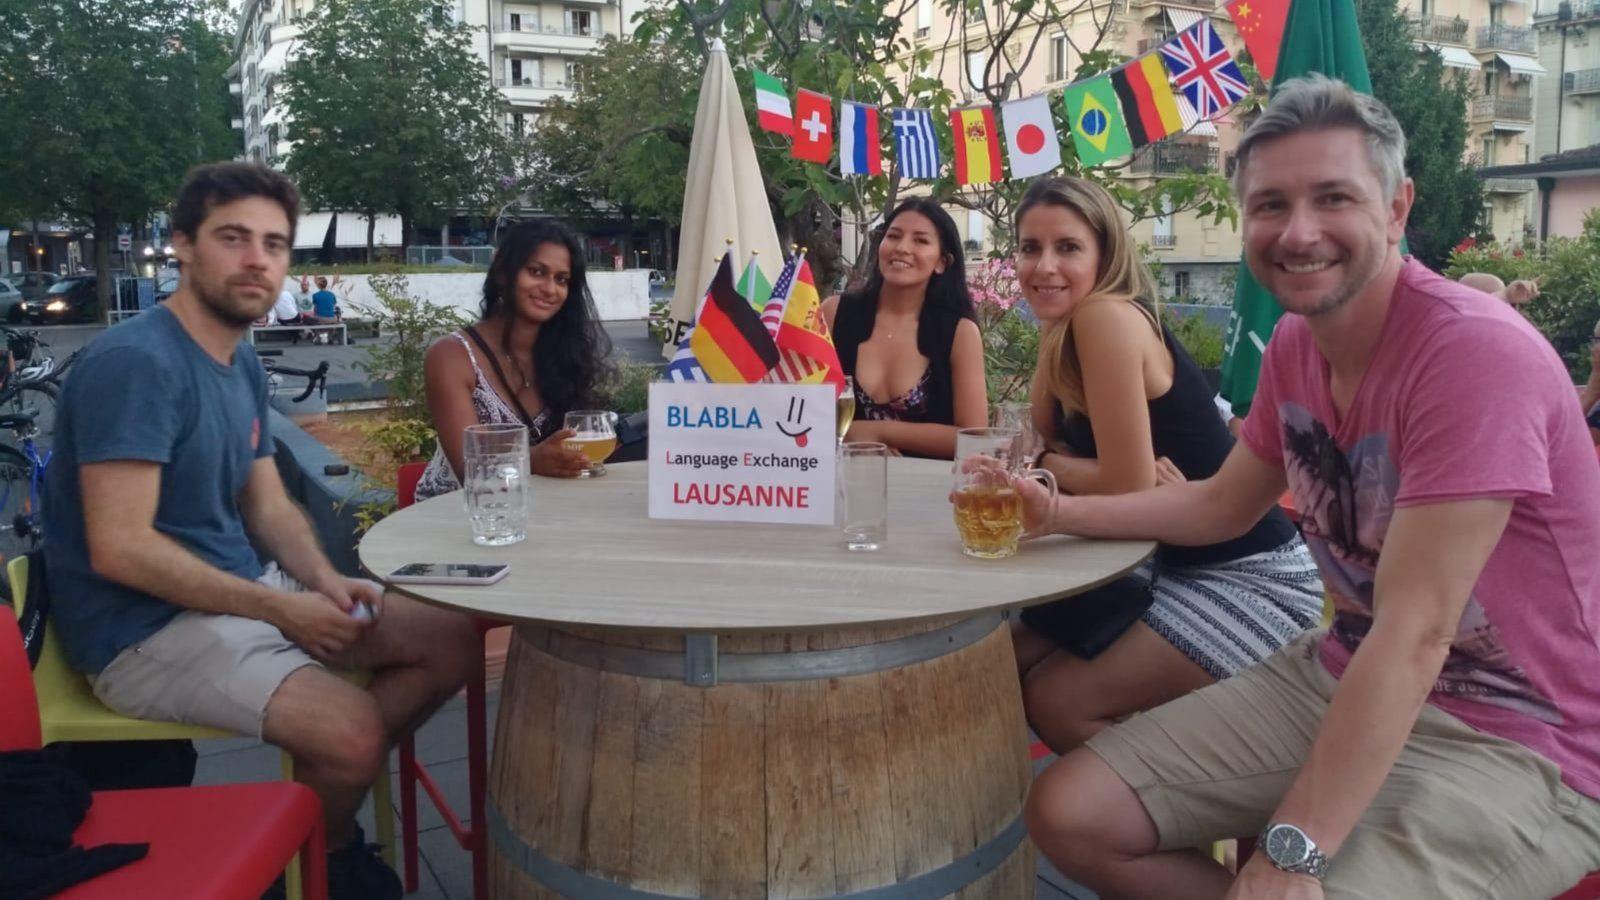 BlaBla Language Exchange - Lausanne